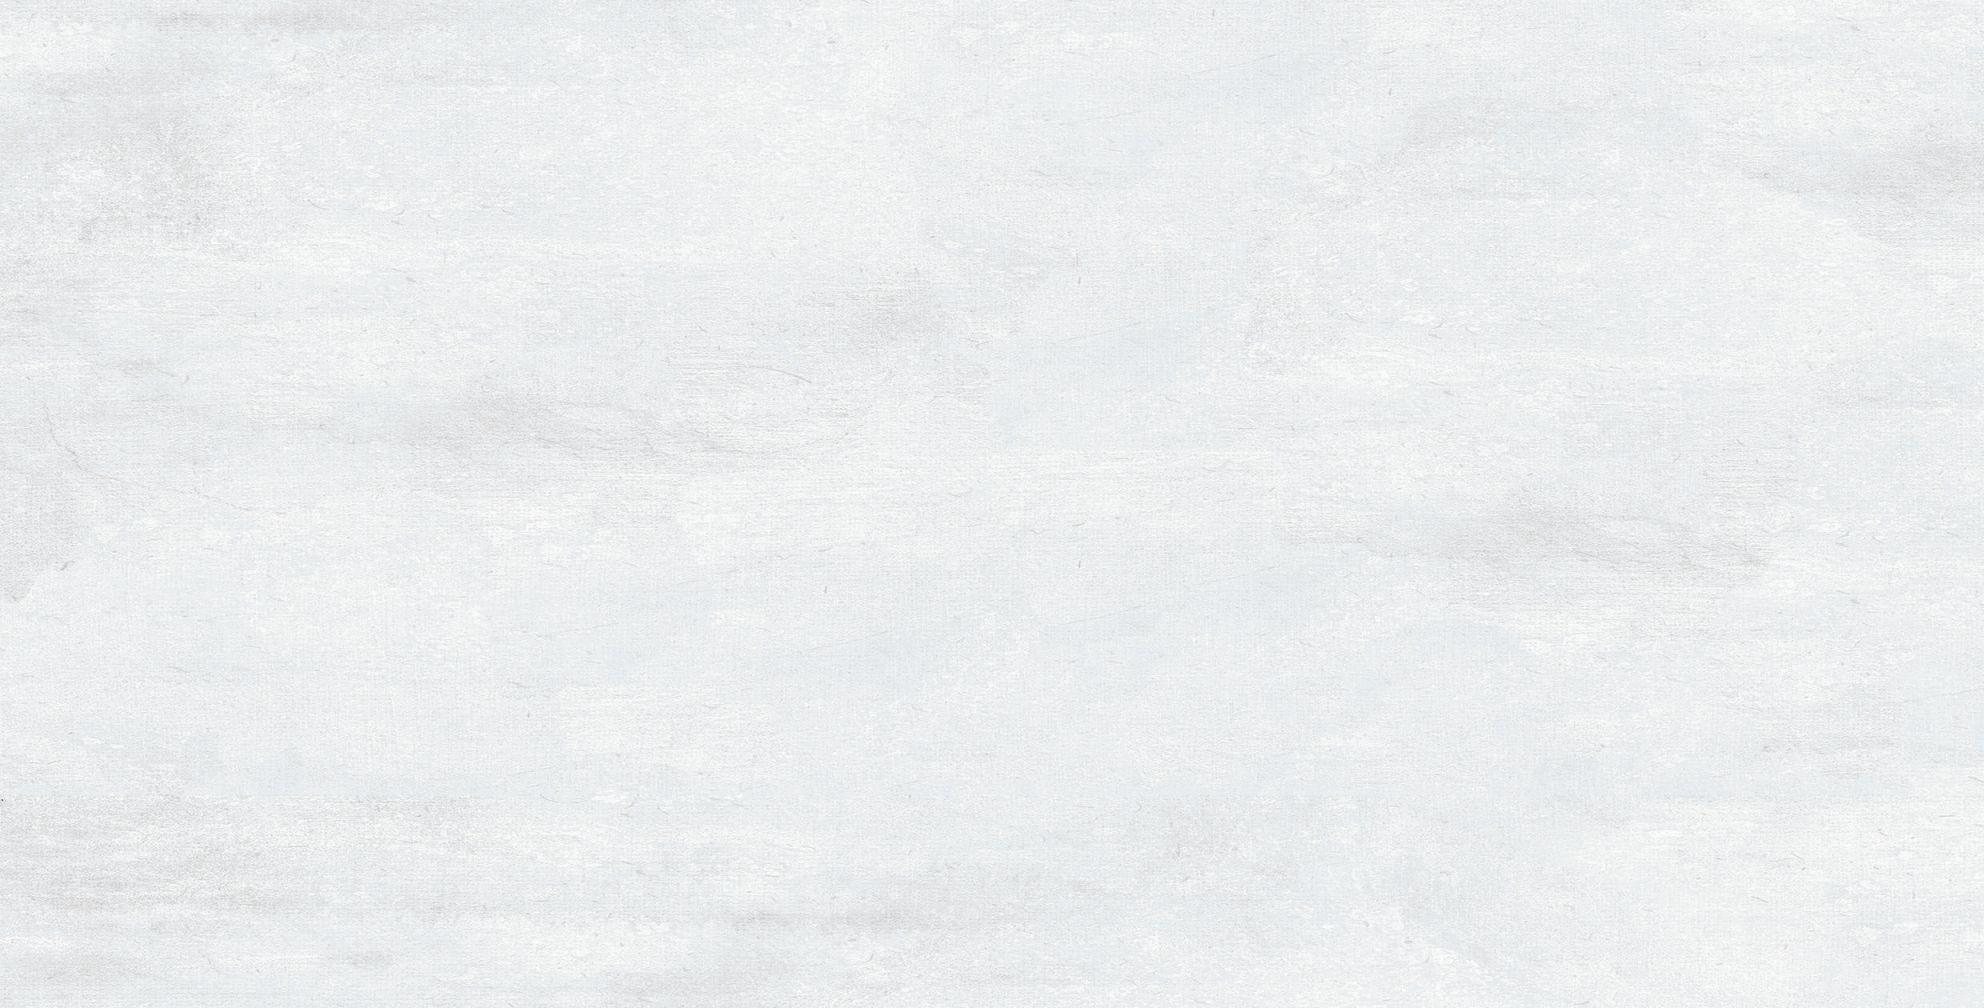 JÄÄK Seta grau matt SET91A 30x60x0,8 II sort - Hansas Plaadimaailm